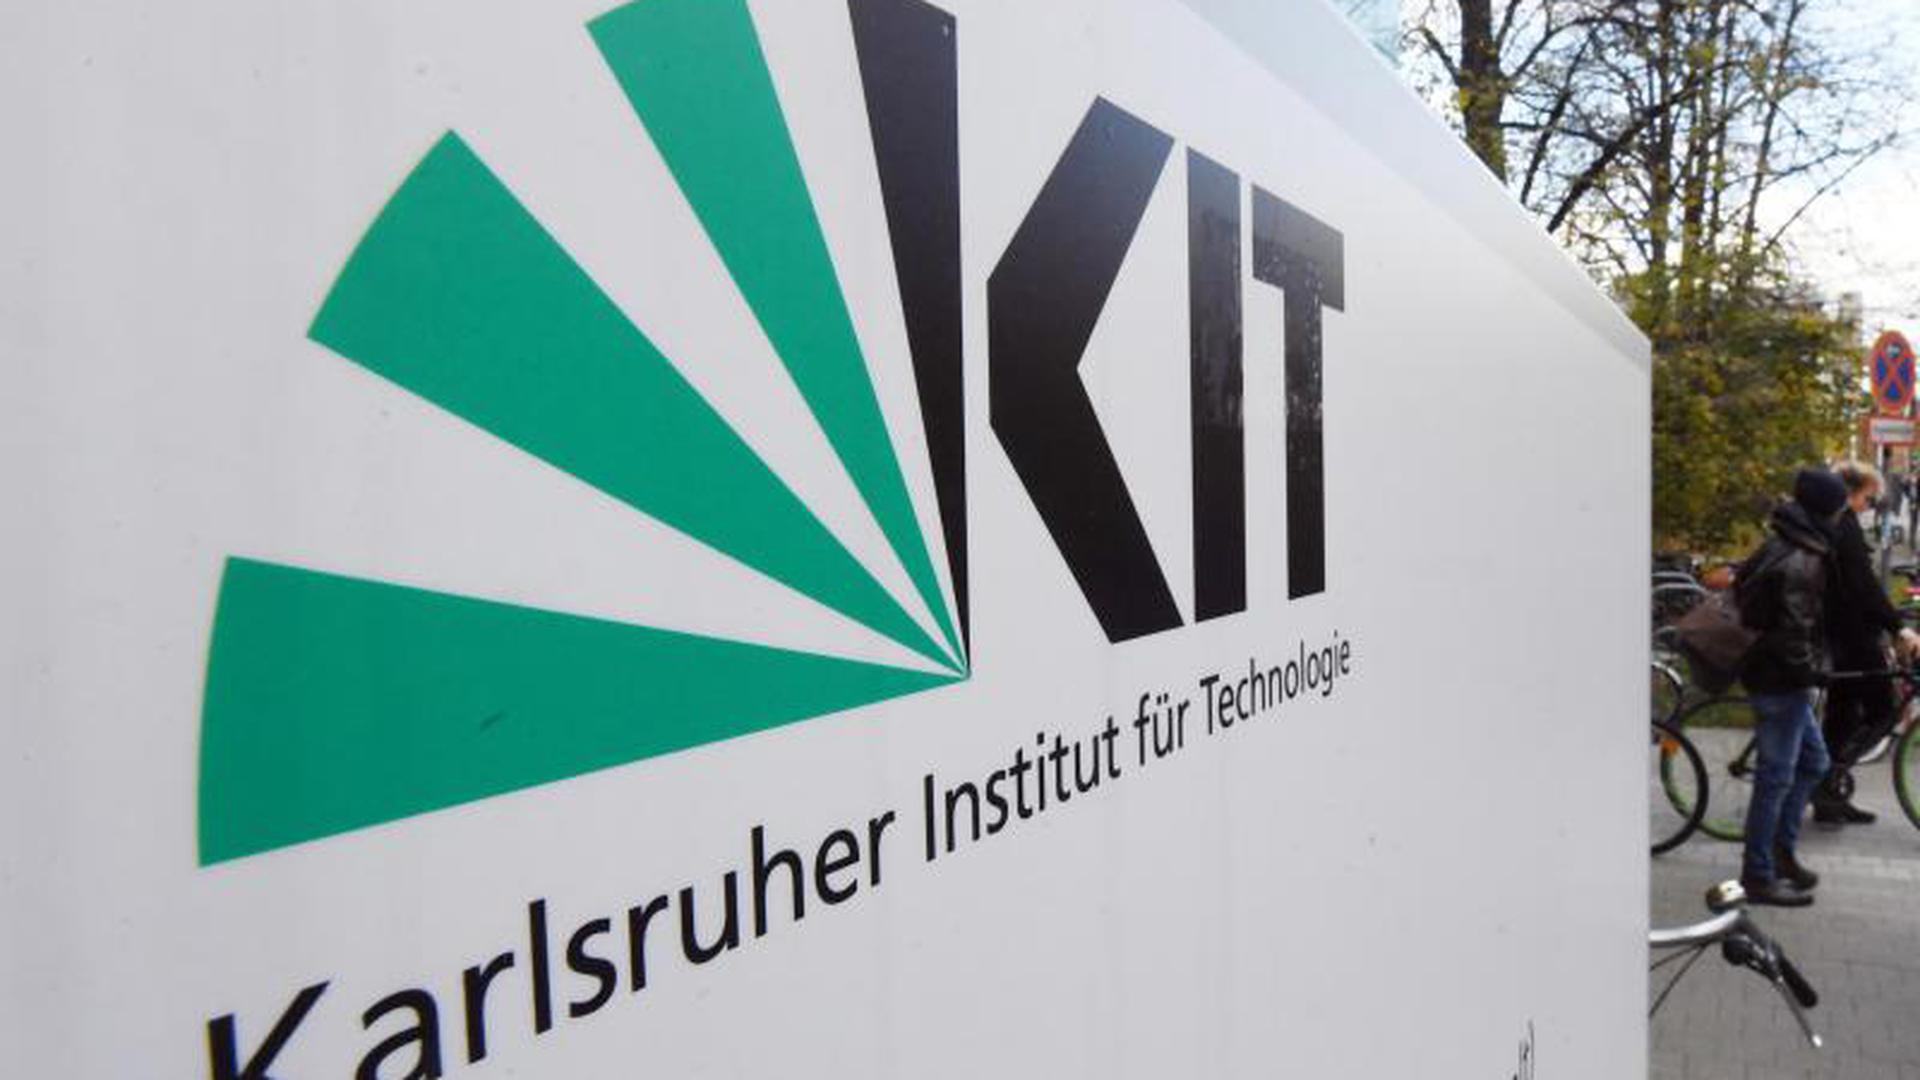 KIT in Karlsruhe